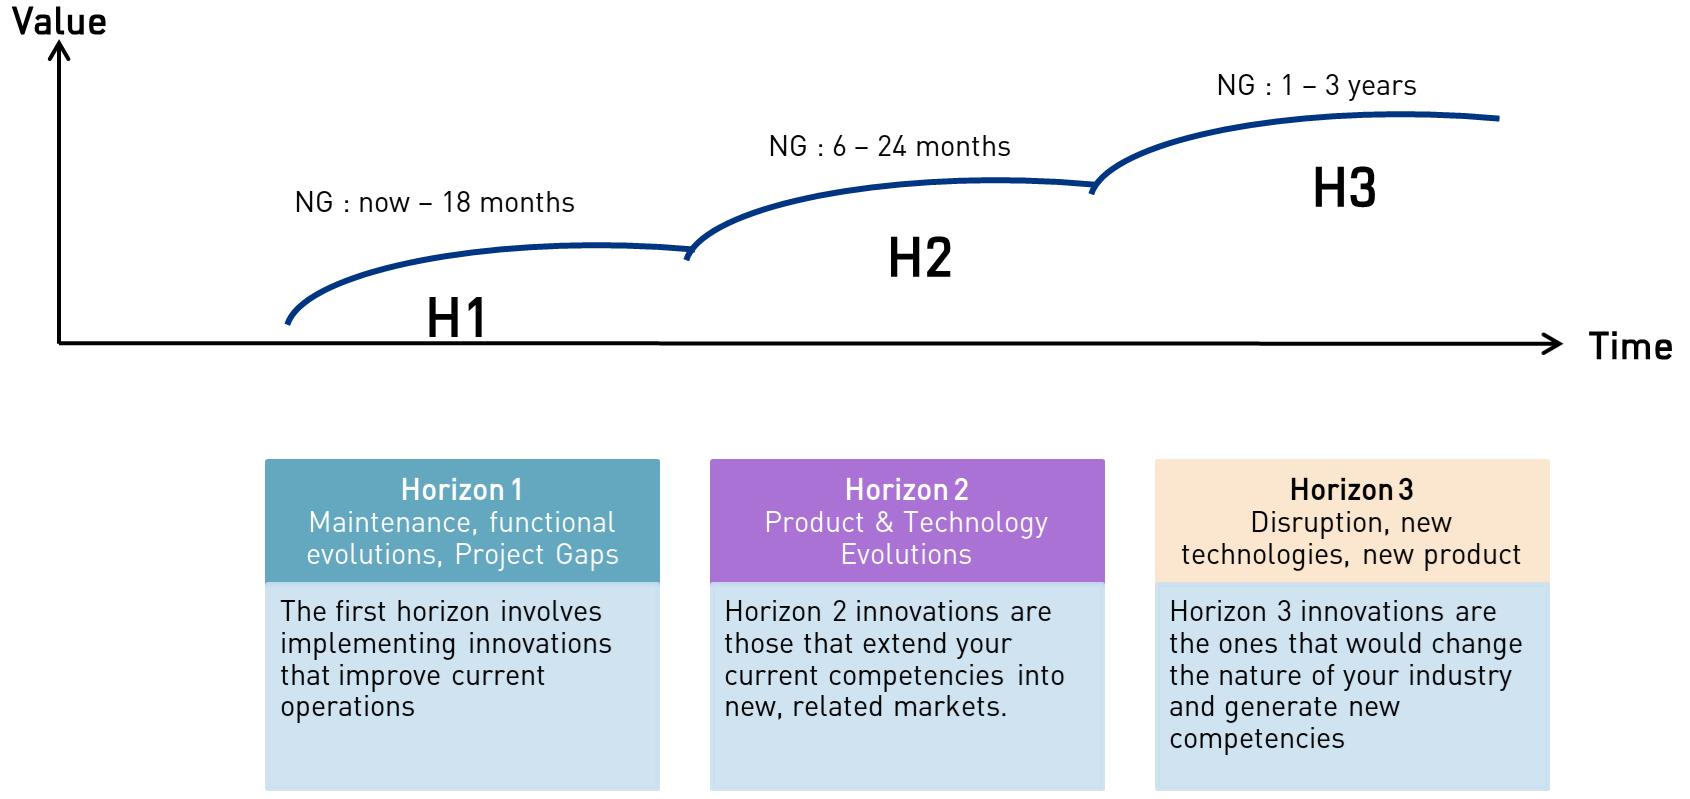 Three Horizons description